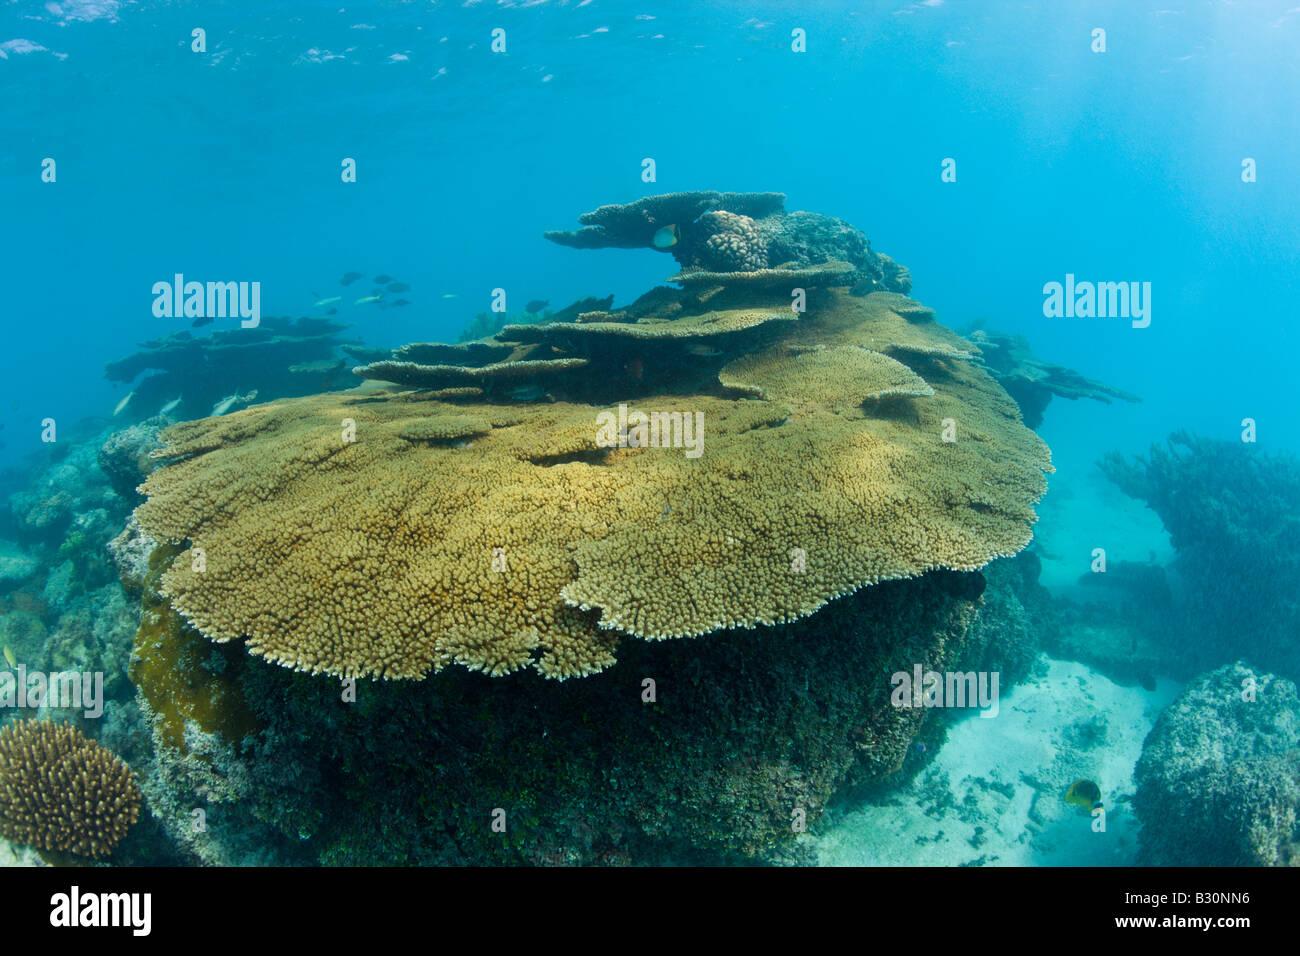 Tabella dei coralli in Bikini Lagoon Isole Marshall Bikini Atoll Micronesia Oceano Pacifico Immagini Stock